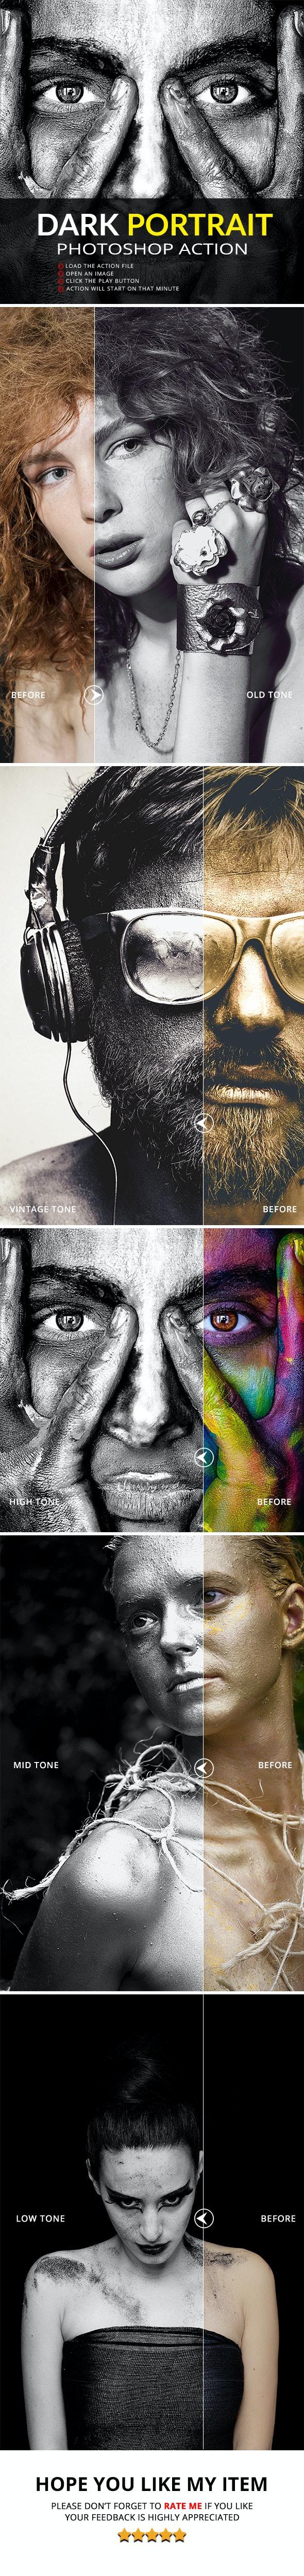 5 Dark Portrait Photoshop Action - Photo Effects Actions